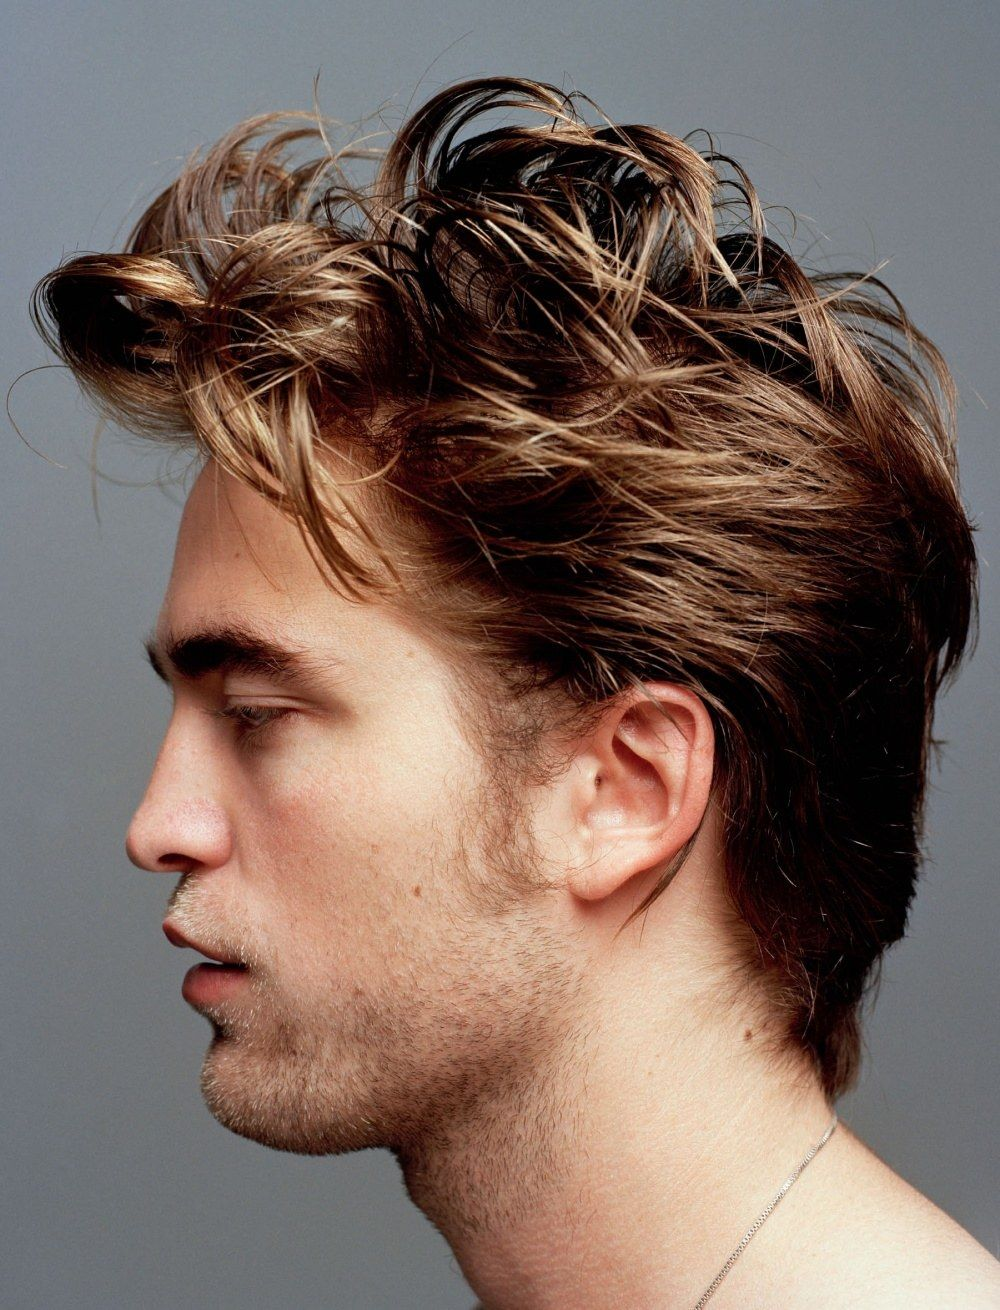 Robert Pattinson Robert Pattinson Stylish Hair Mens Hairstyles